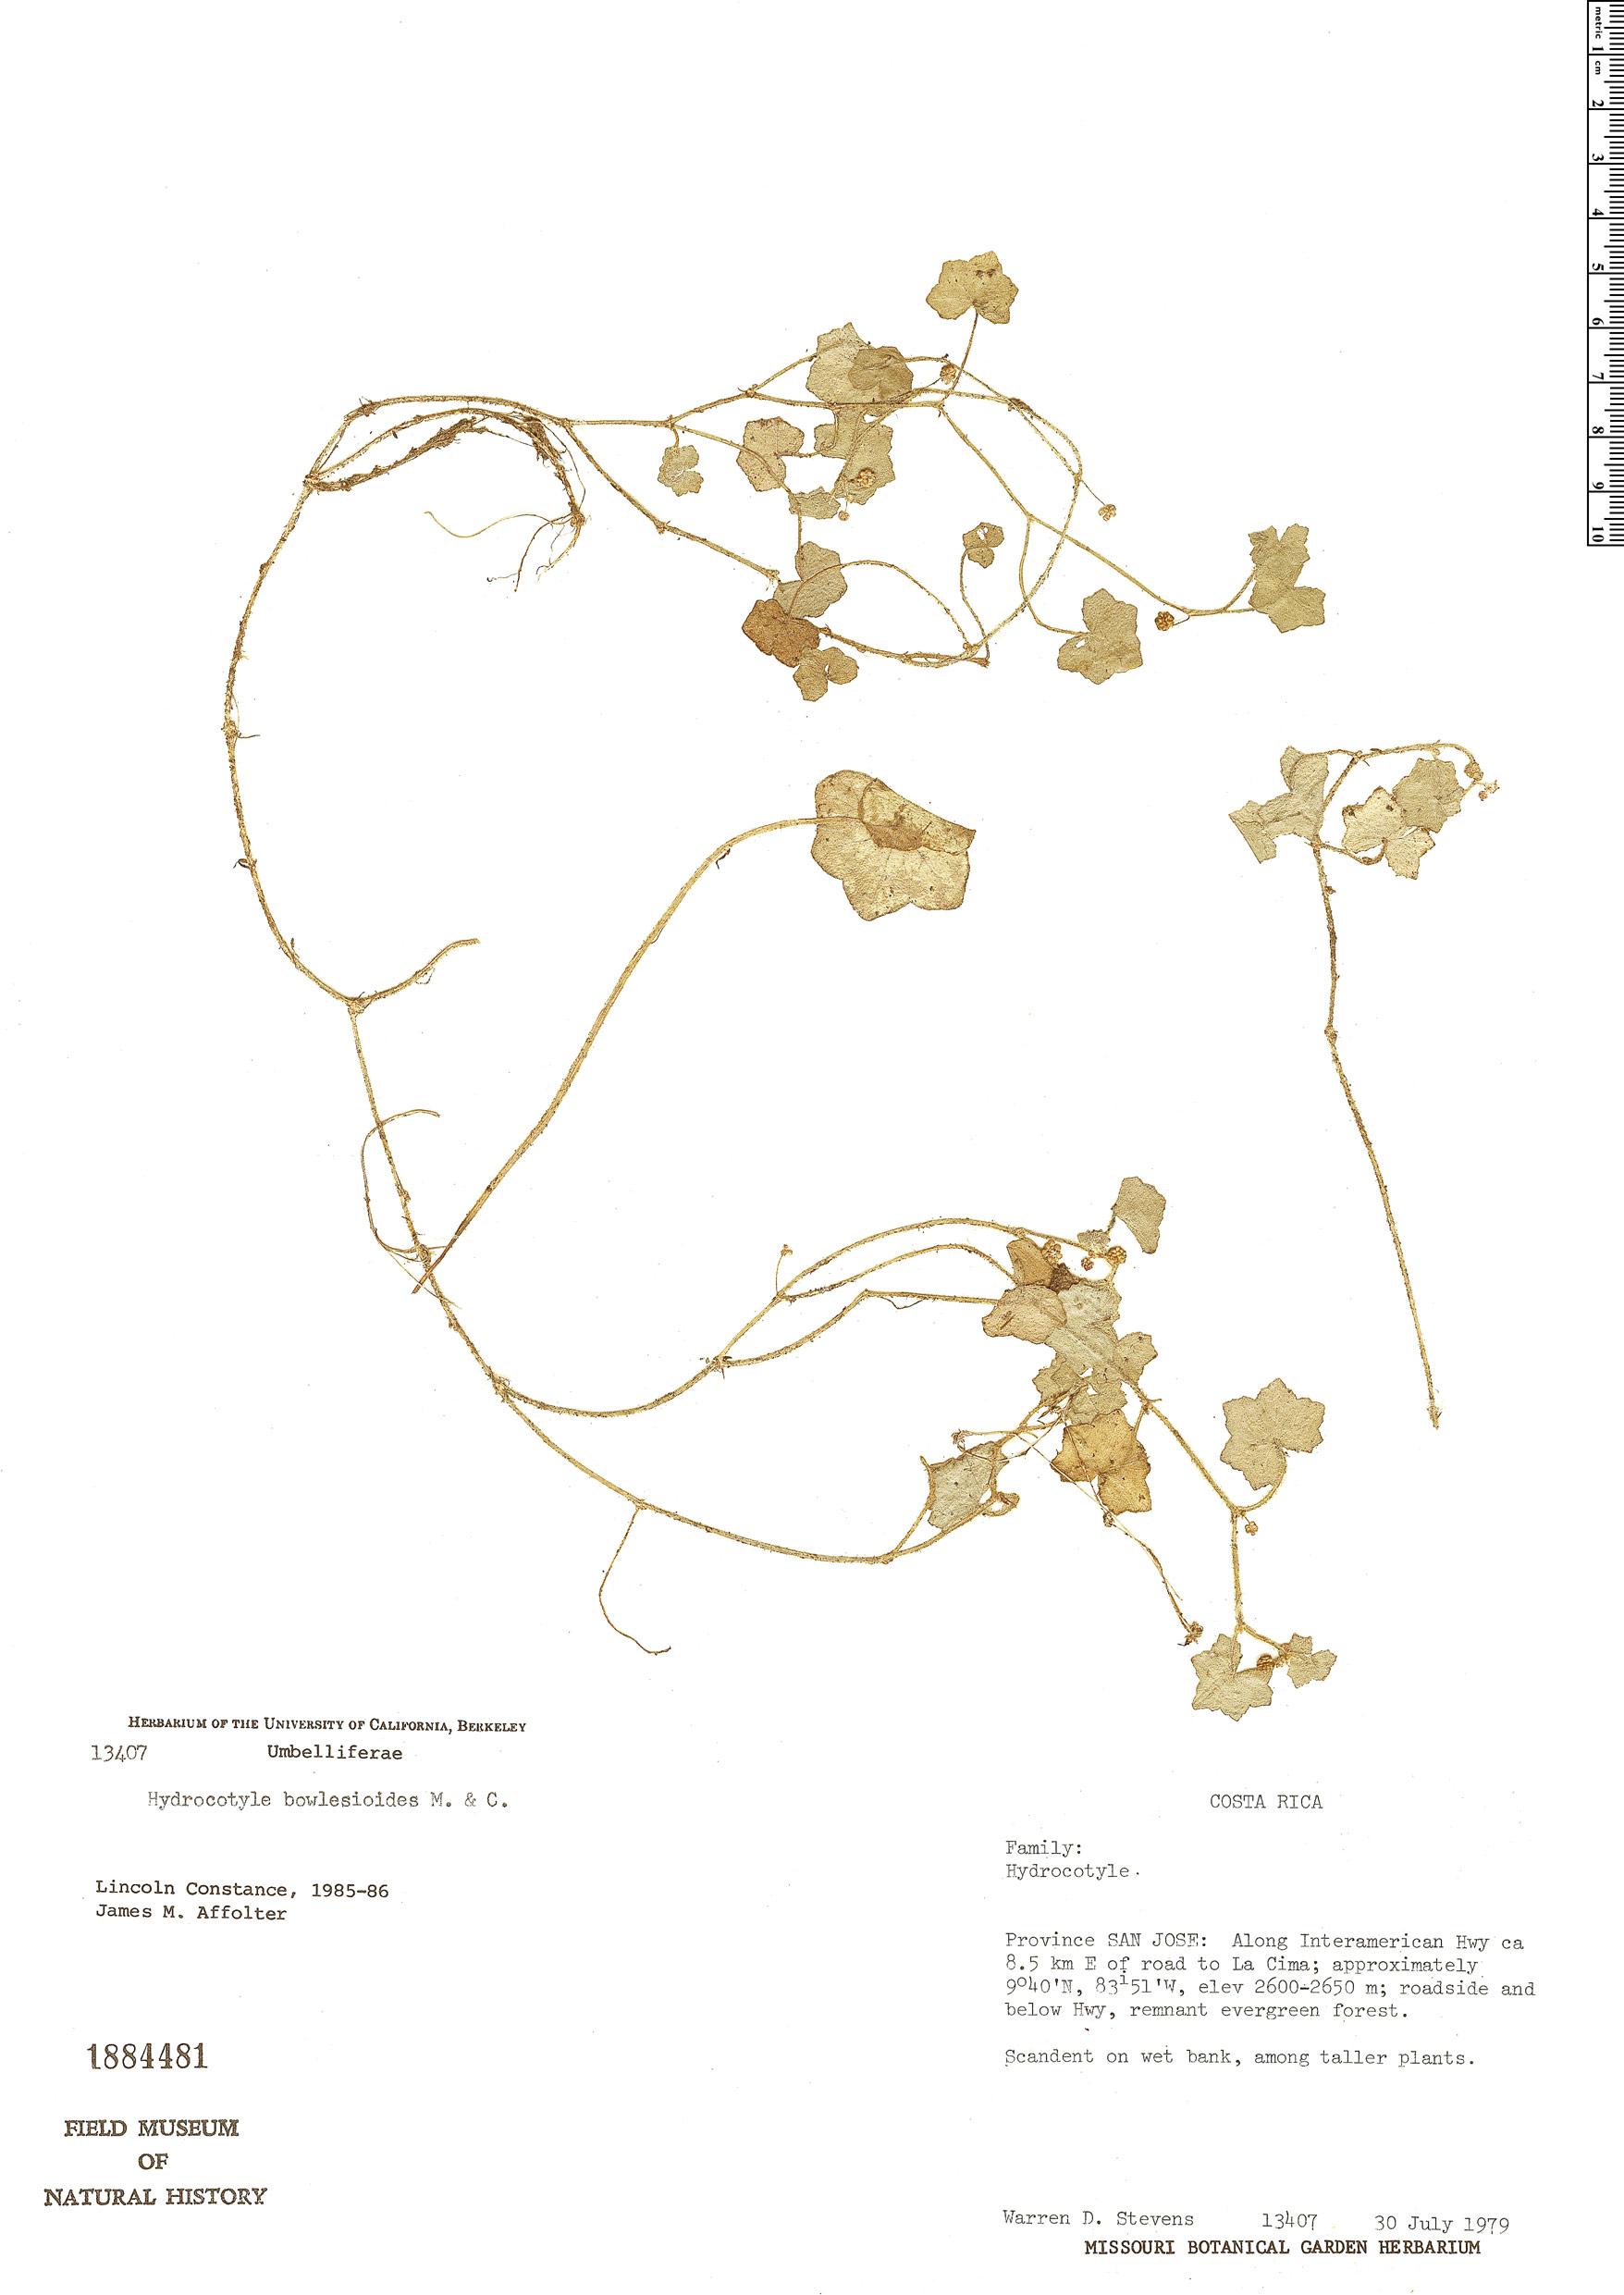 Specimen: Hydrocotyle bowlesioides